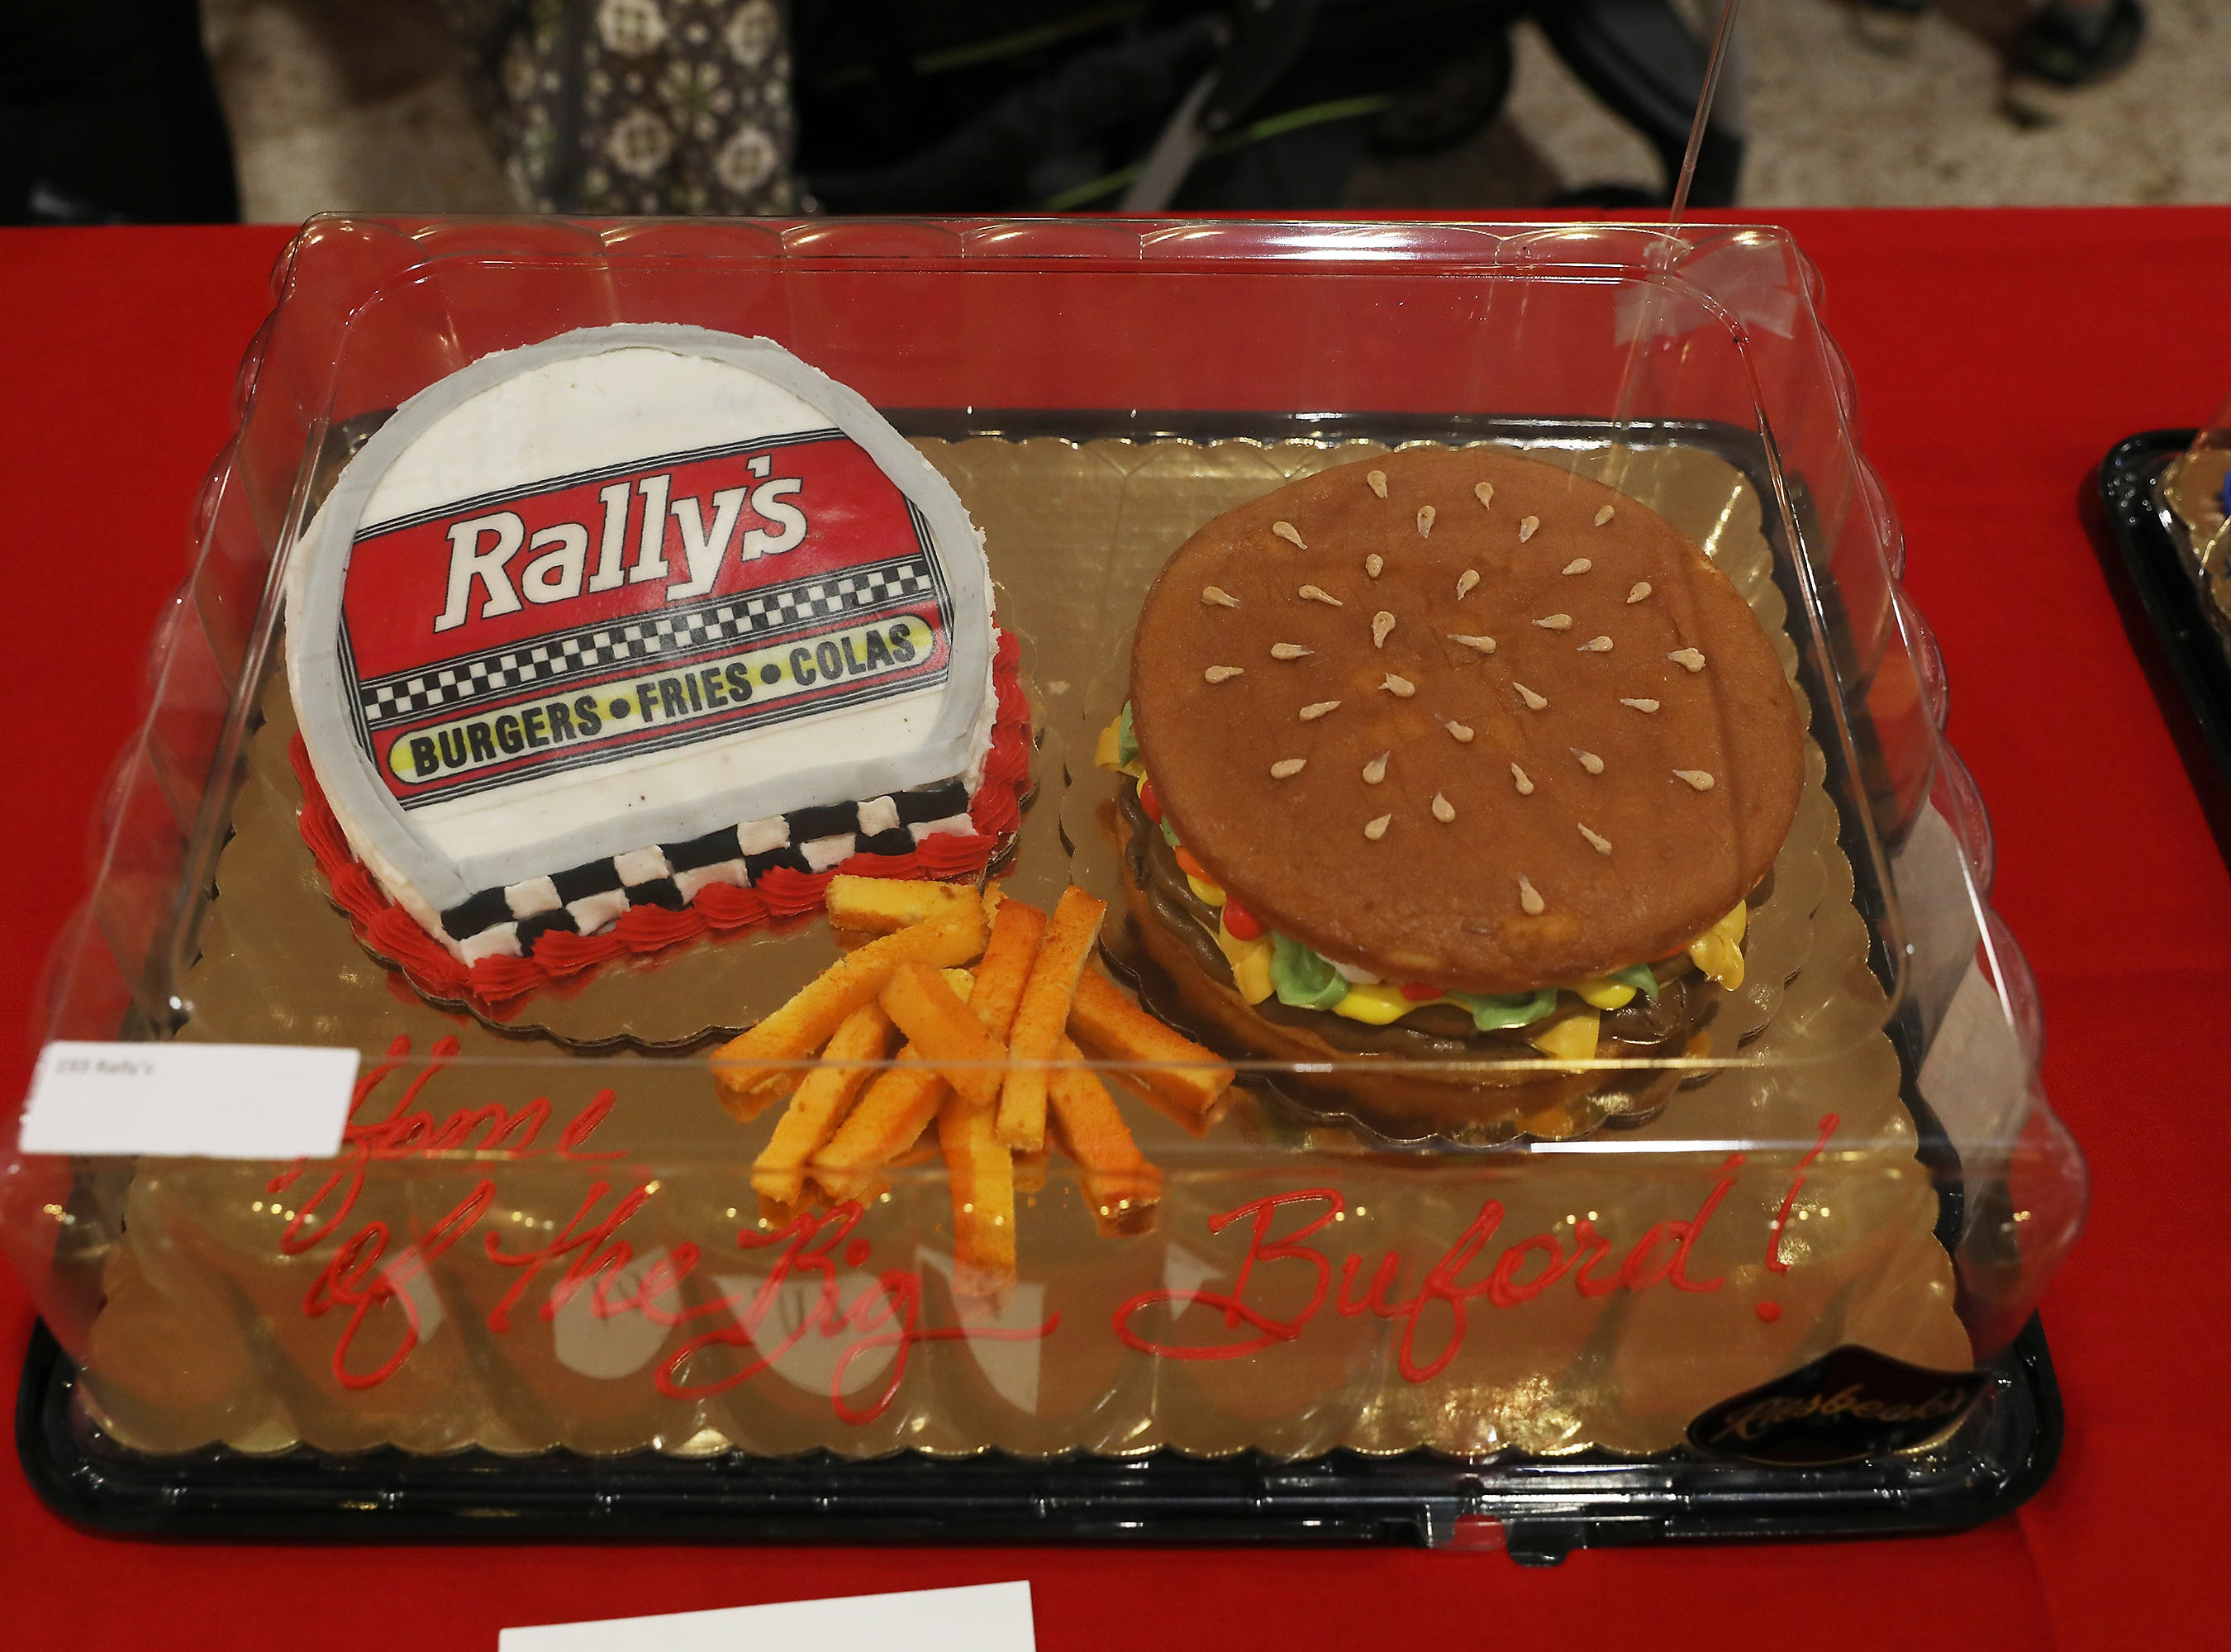 5:15 P.M. Thursday cake 193 Rally's - 12 combos